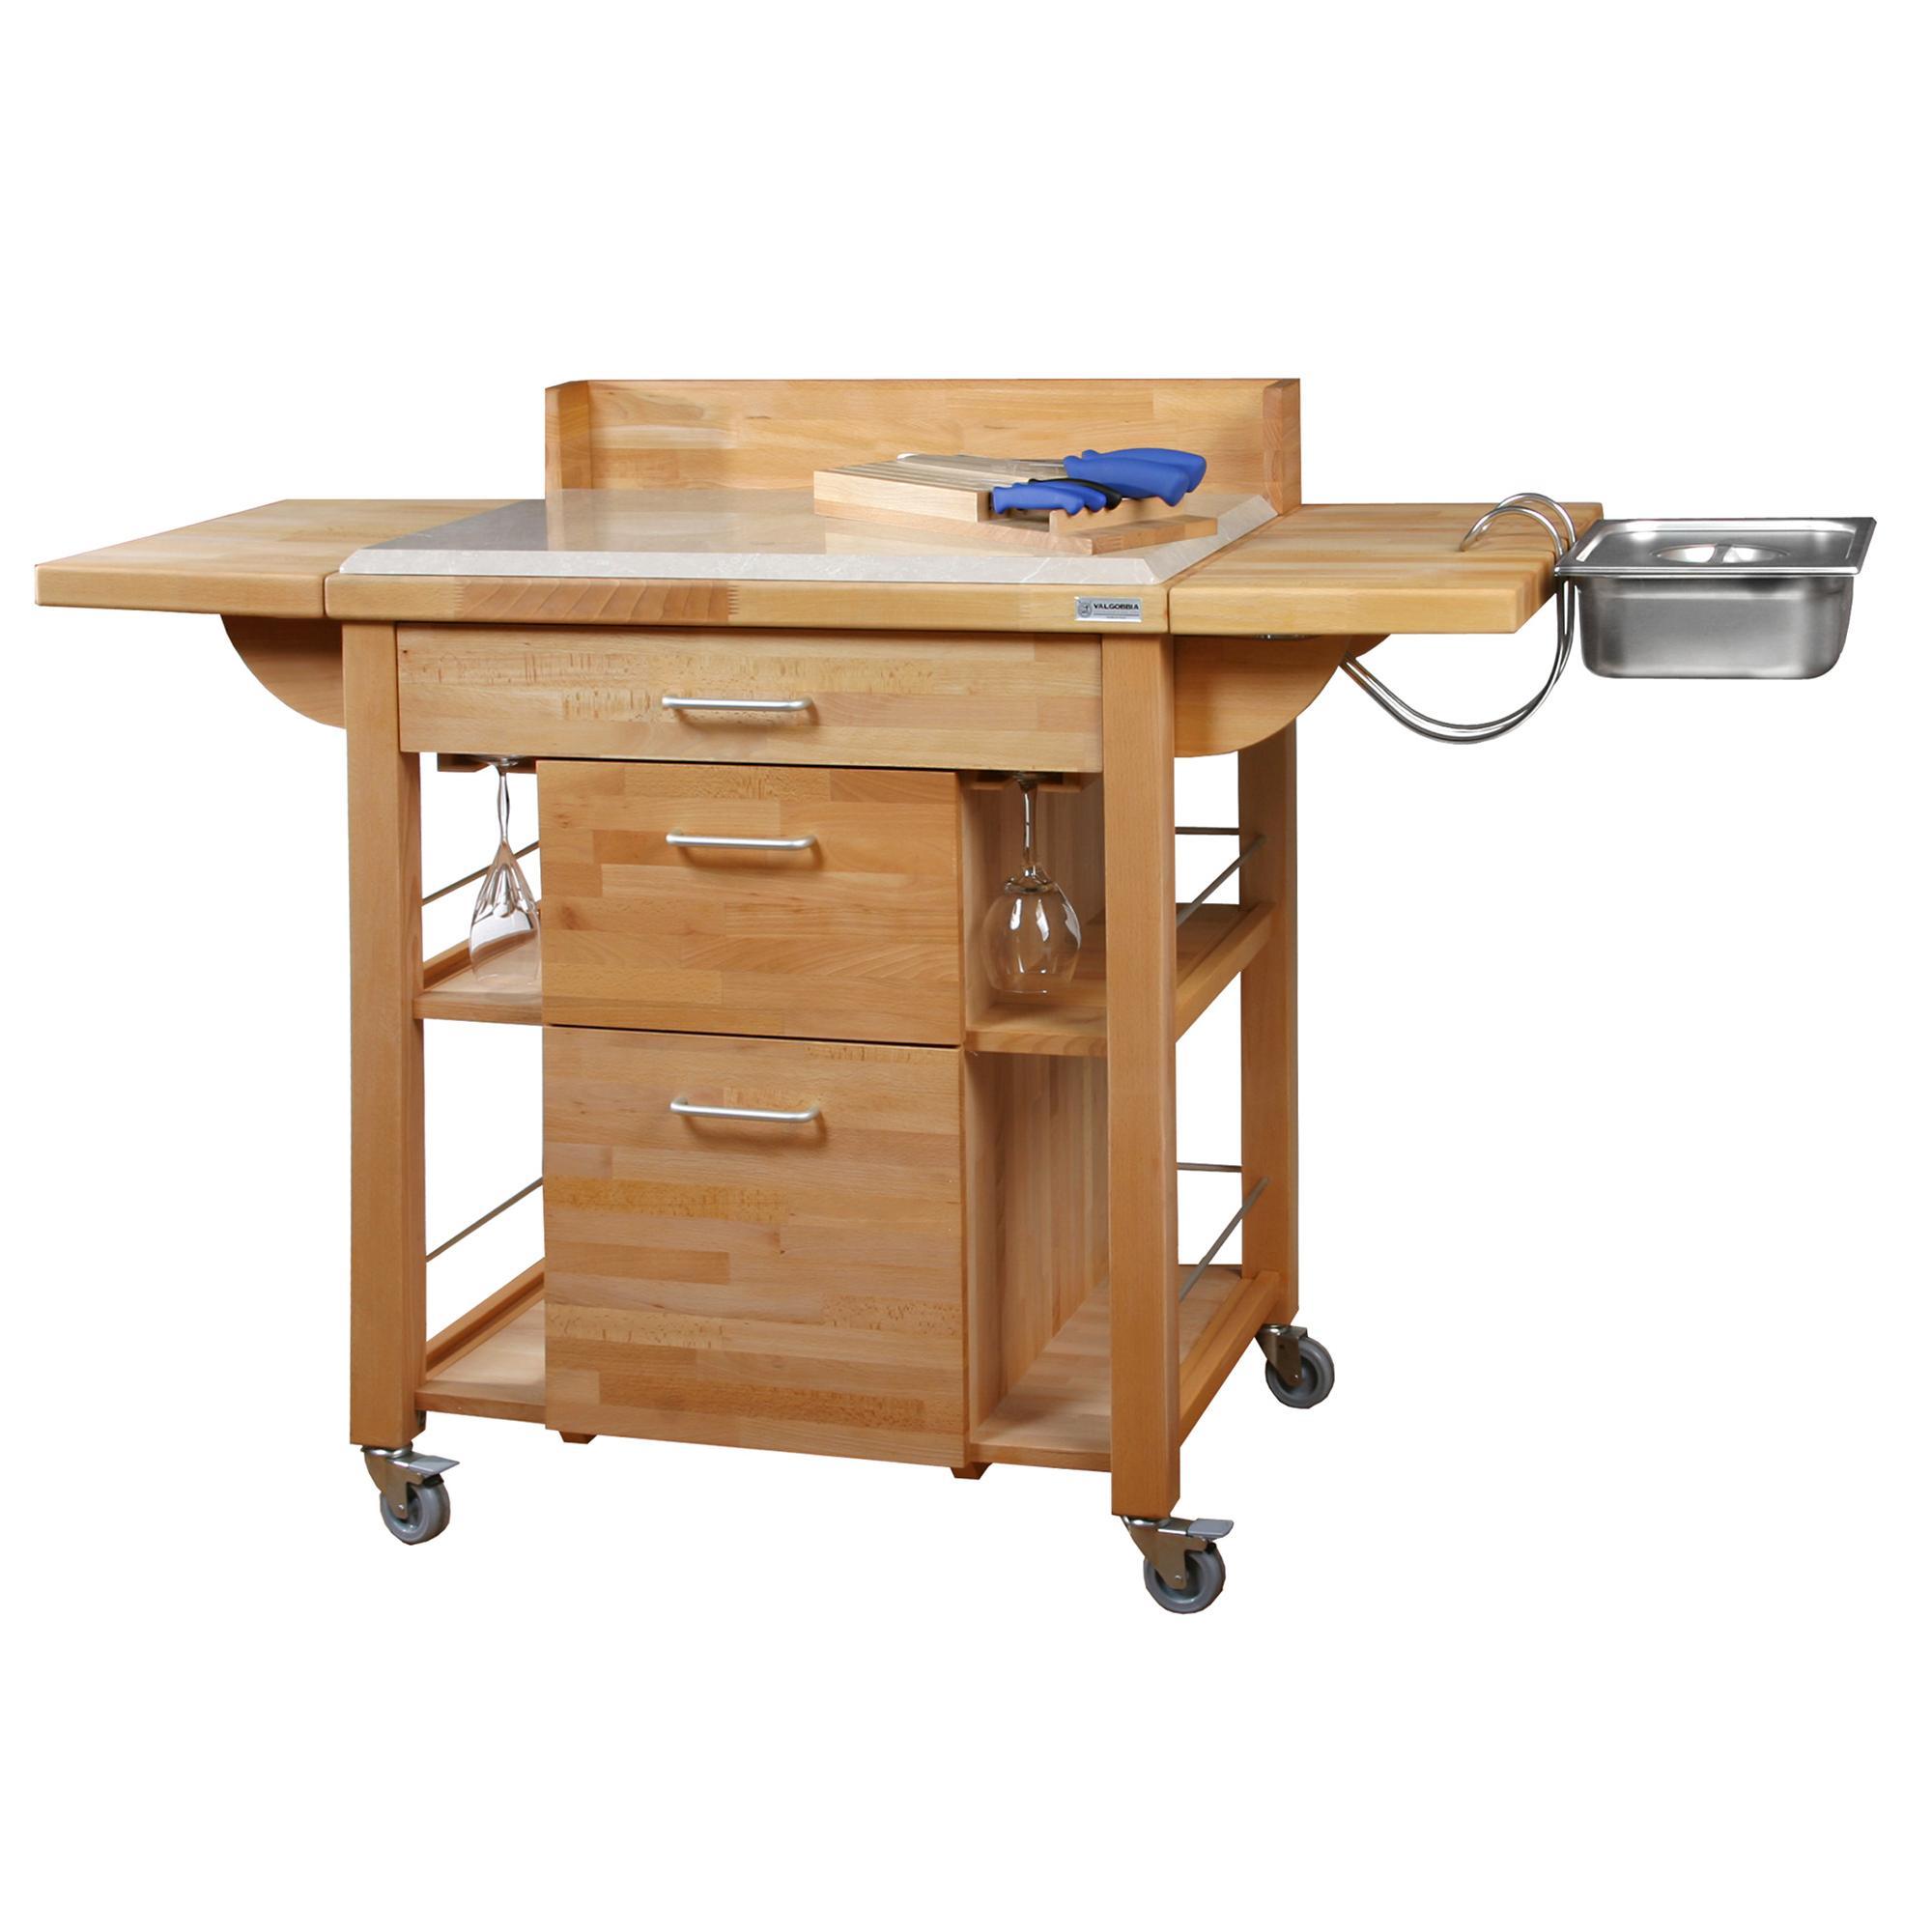 Carrello da cucina a servire 120x80xh120 cm in legno listellare di ...